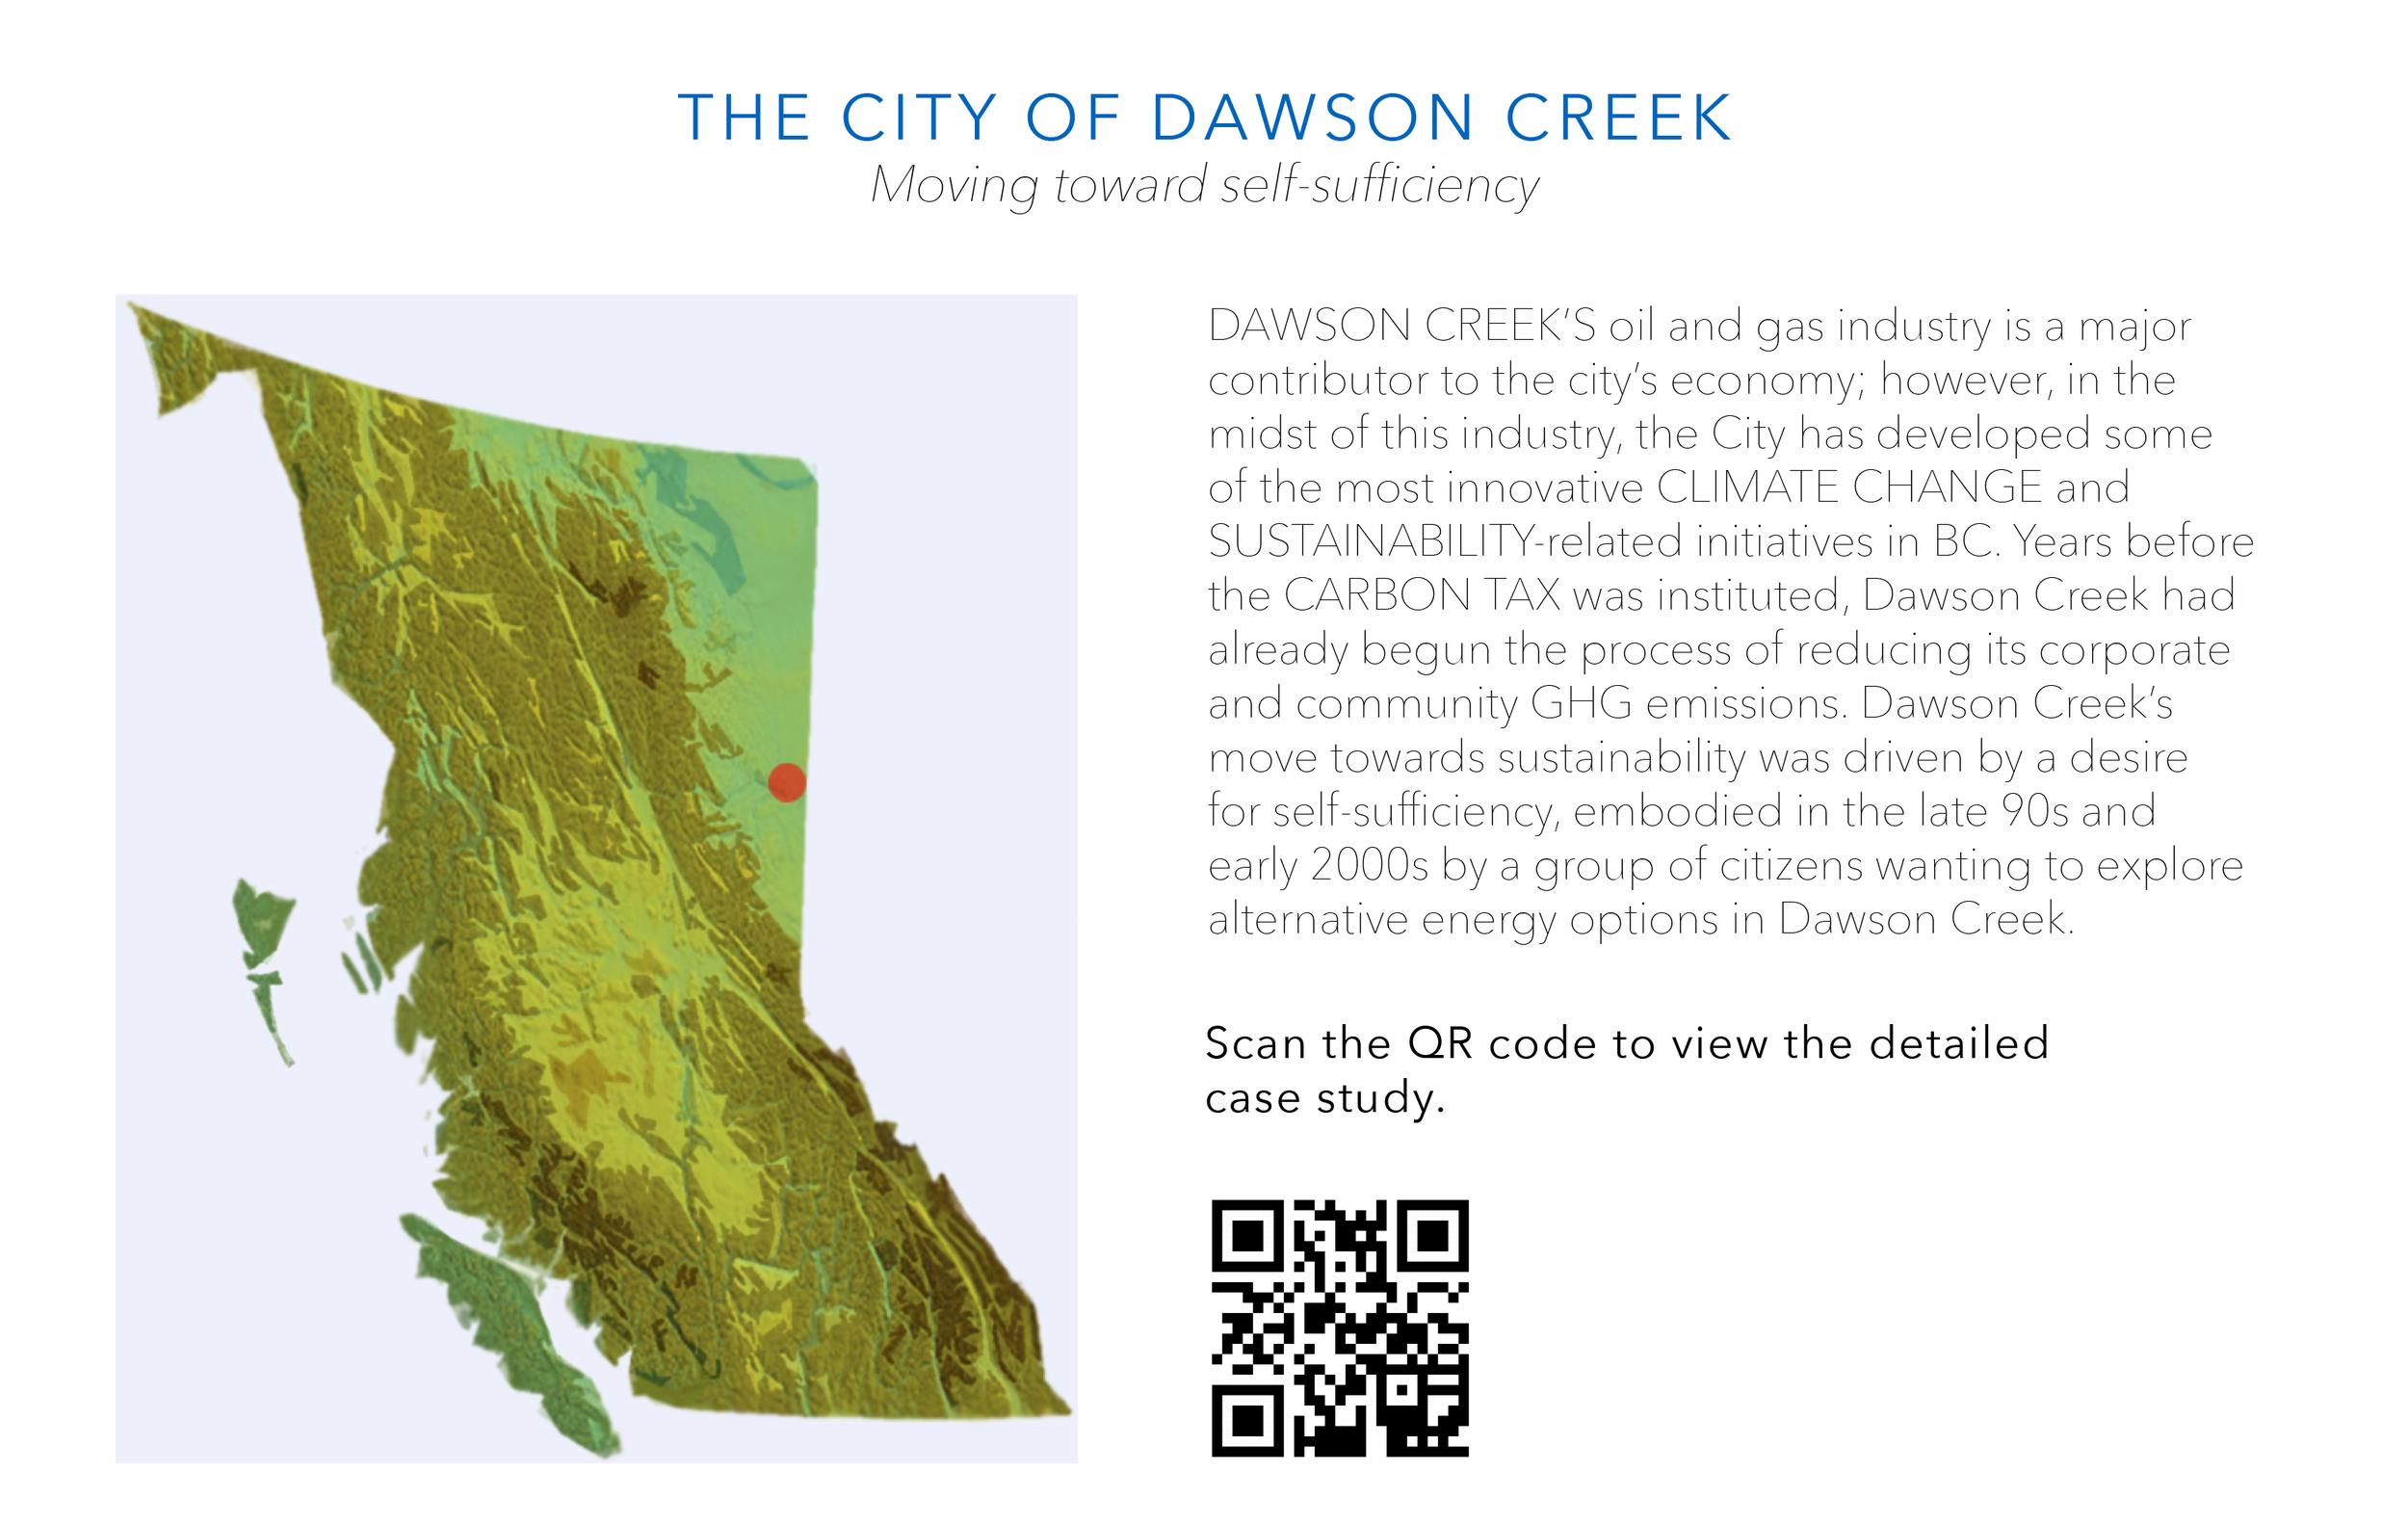 DawsonCreek.png